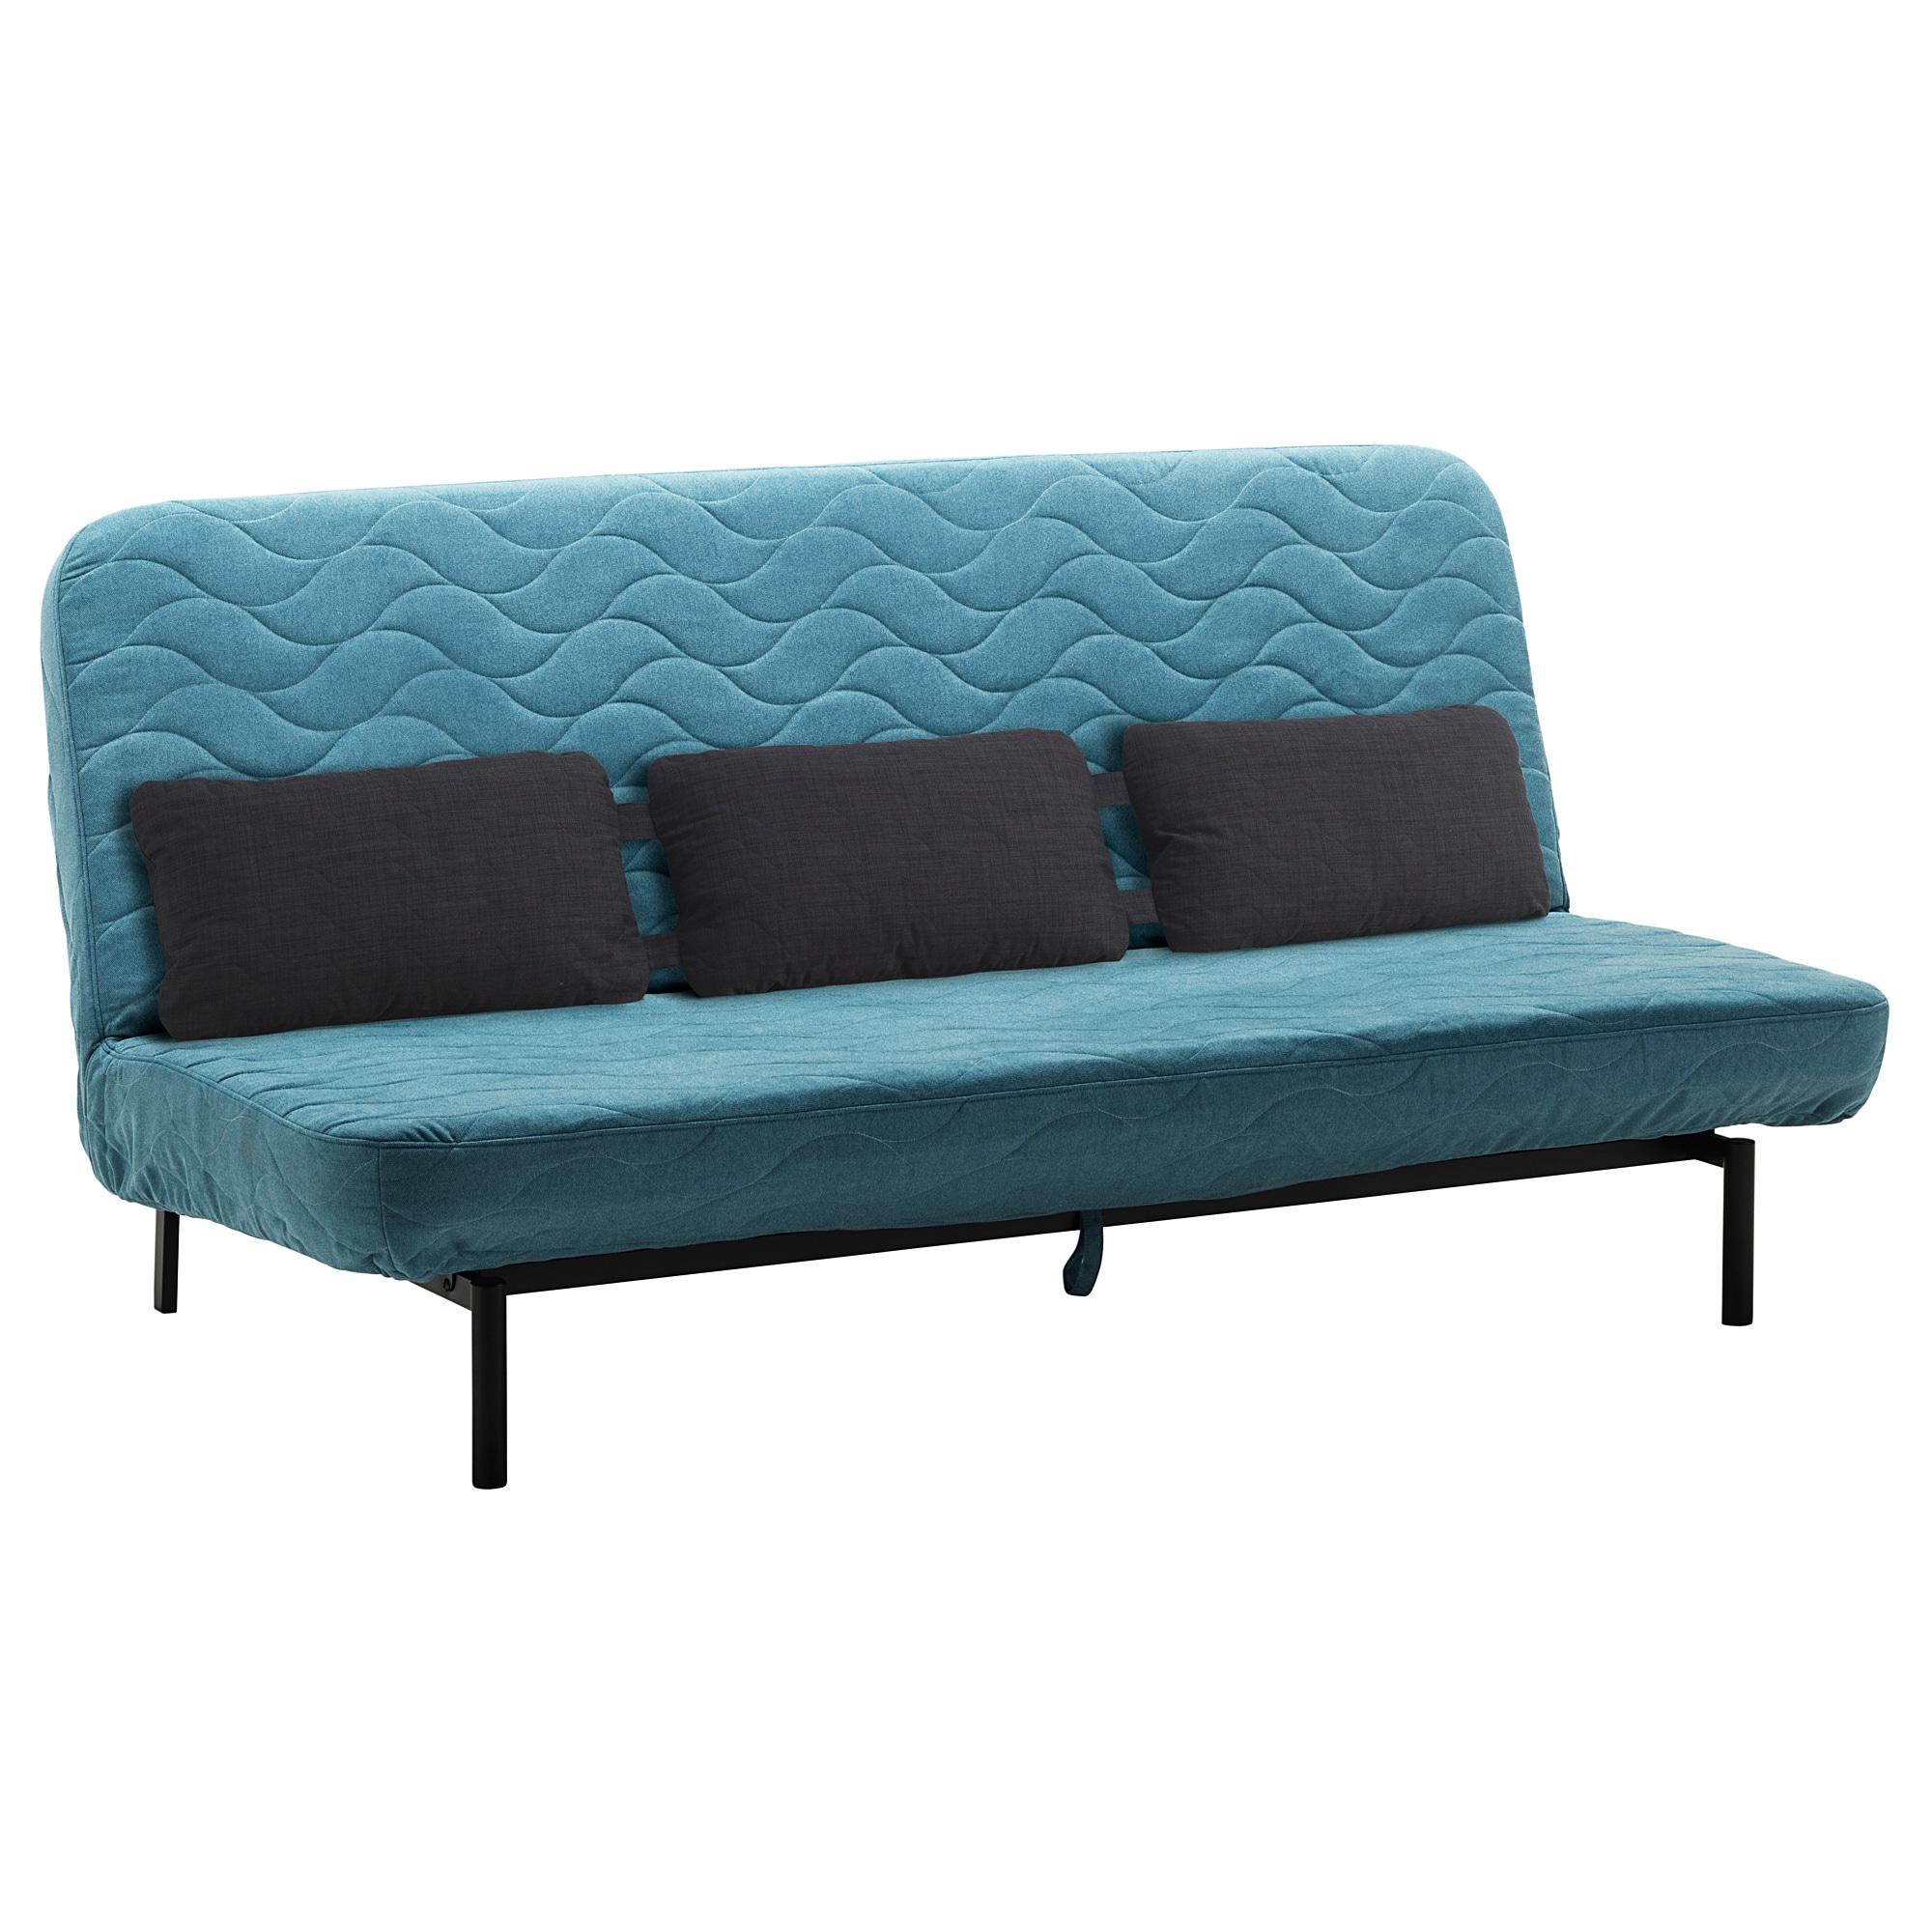 Sofa Cama De Ikea S1du sofà S Cama De Calidad Pra Online Ikea